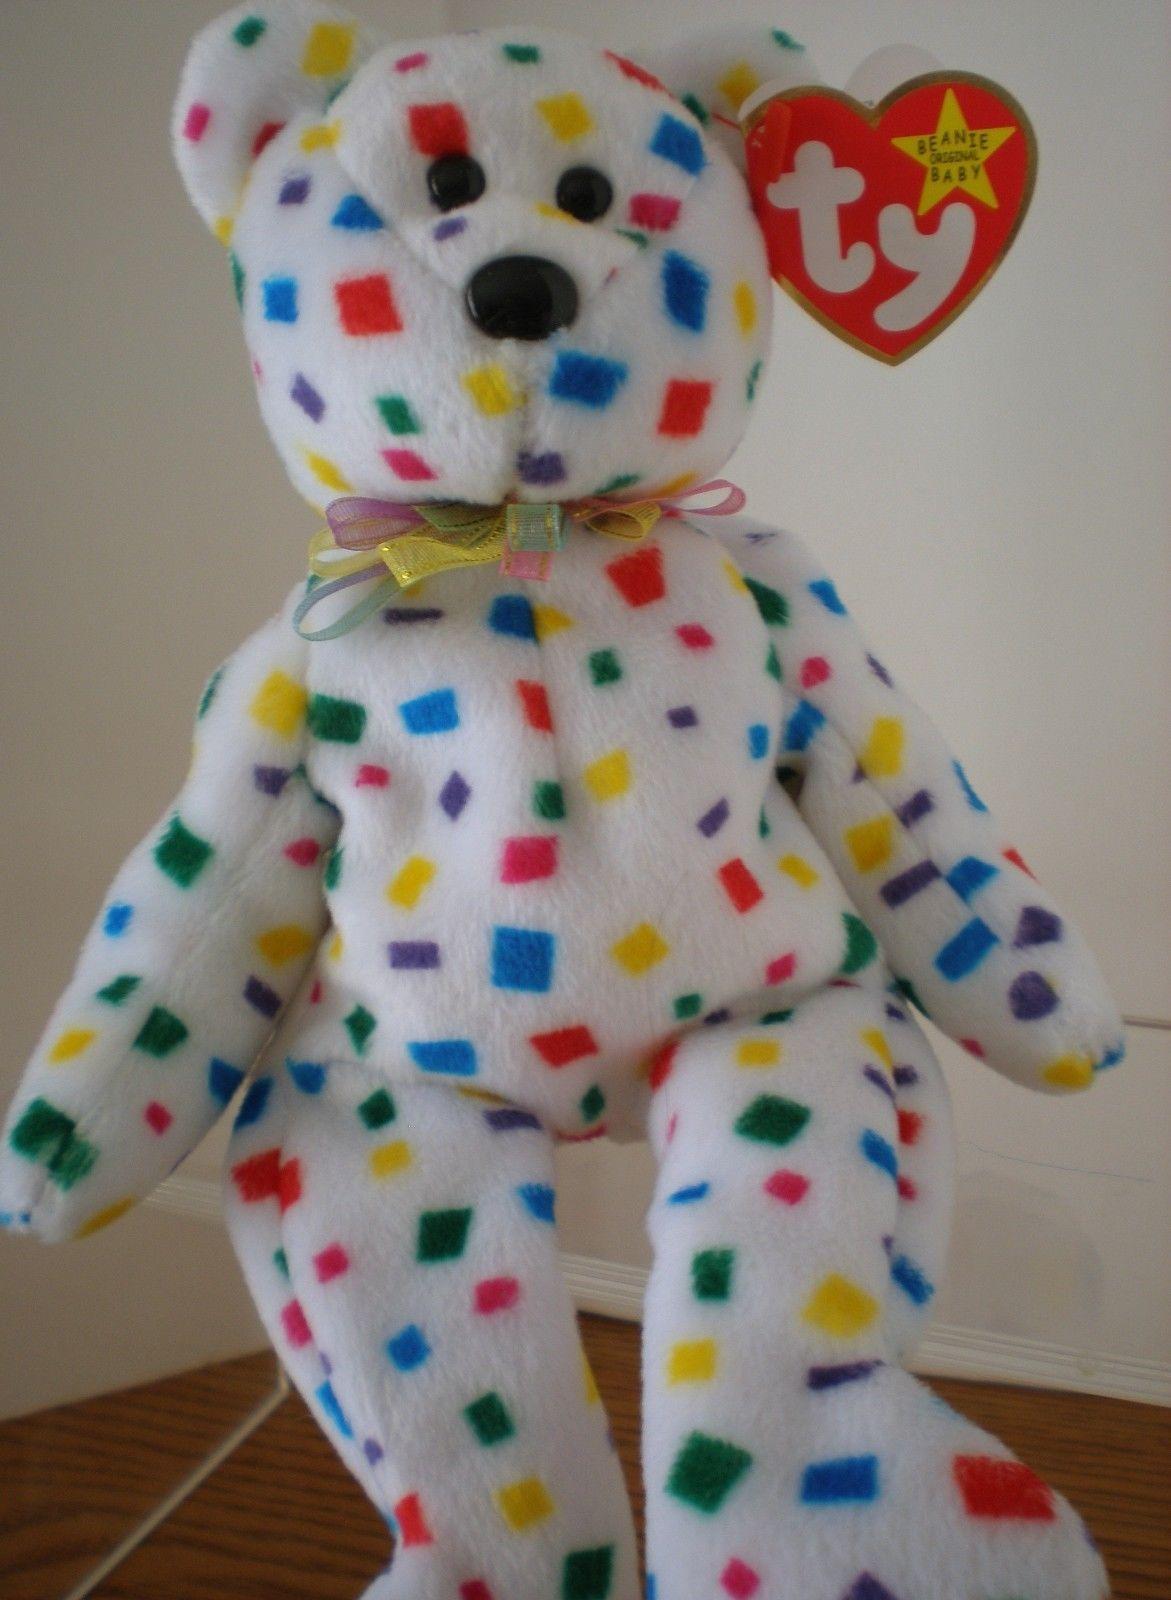 341fdaeb7fd Ty 2K Confetti Bear Original Ty Beanie Baby and 50 similar items. 57